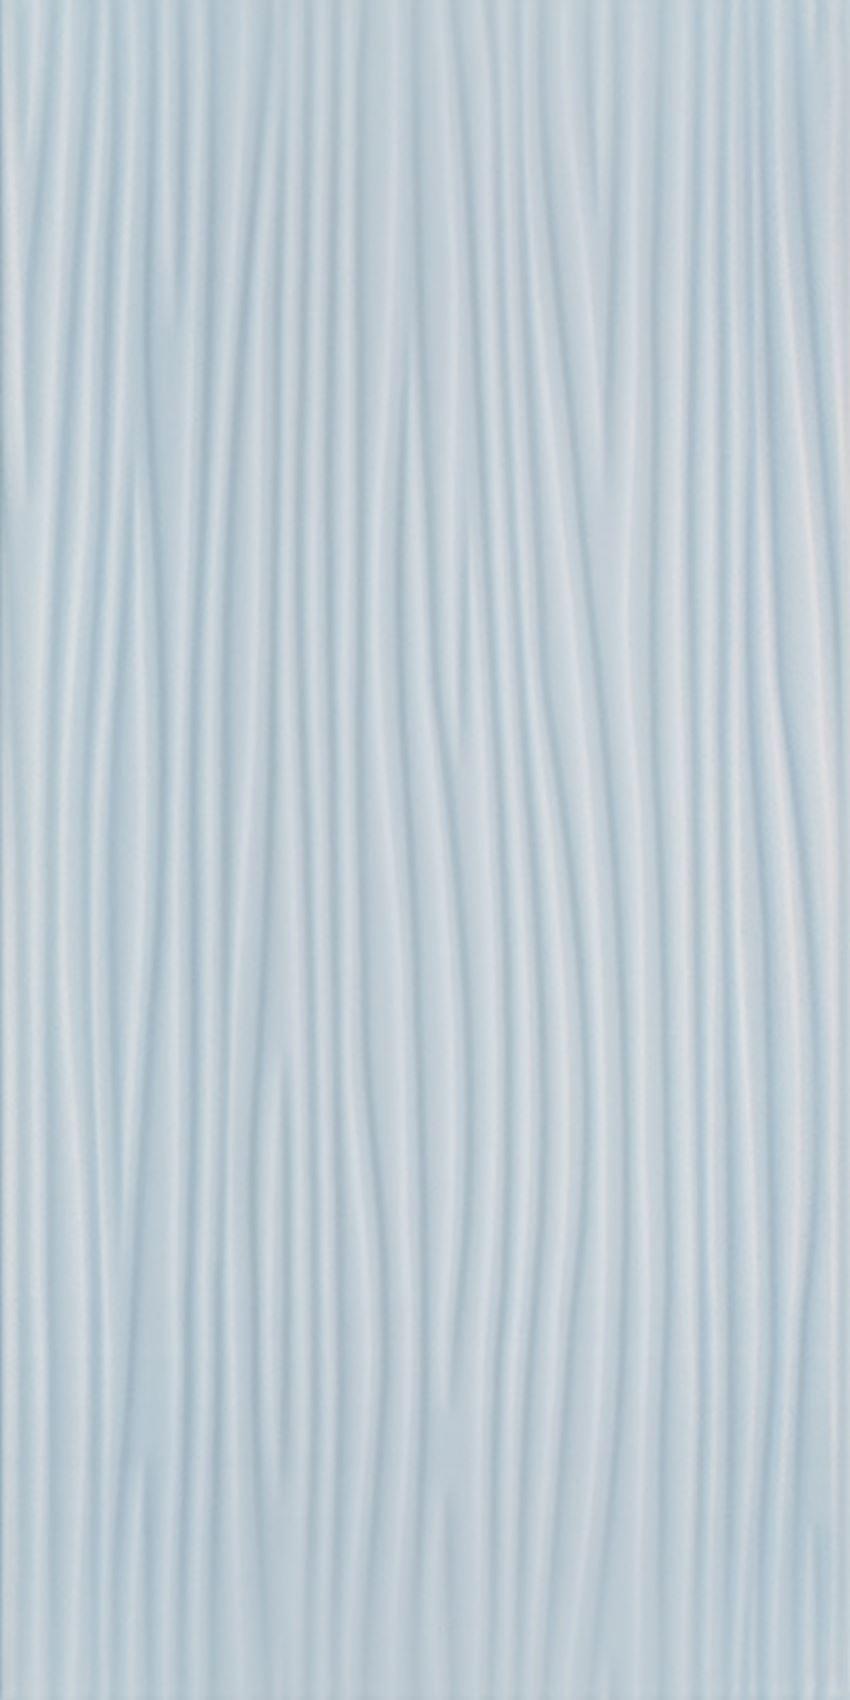 Płytka ścienna 30x60 cm Paradyż Synergy Blue Ściana A Struktura